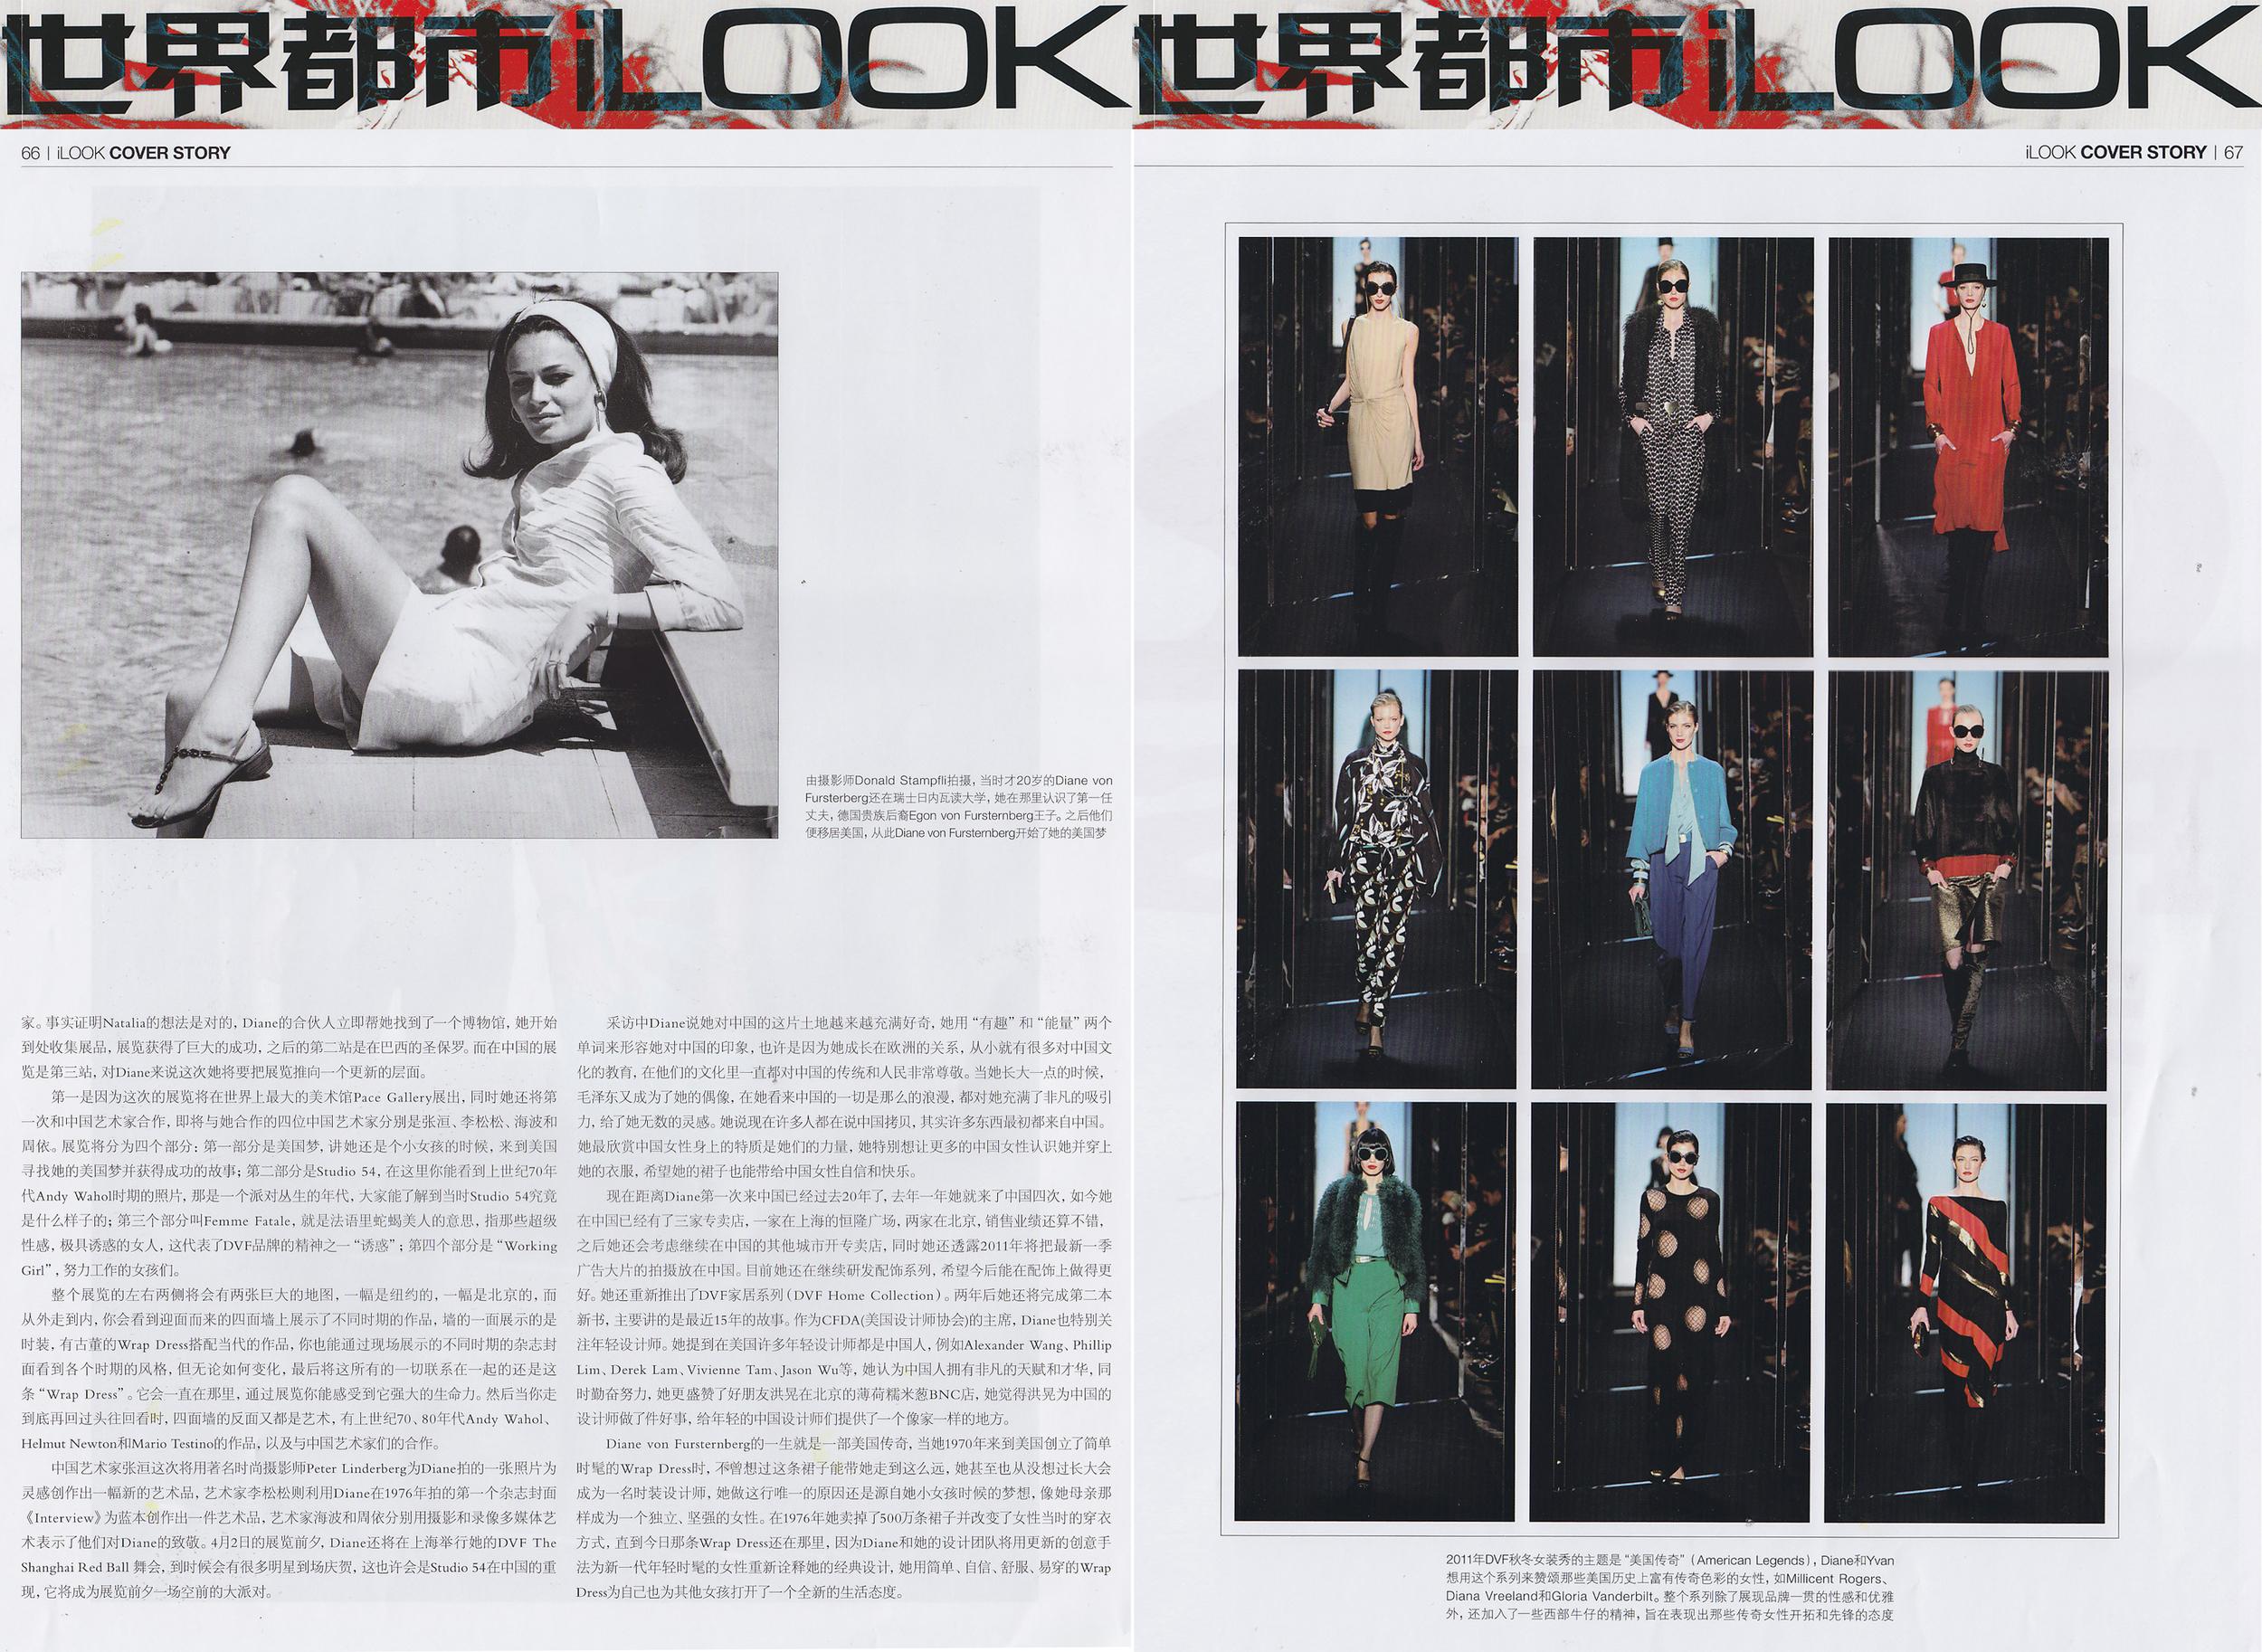 iLook China 05, March 2011.jpg